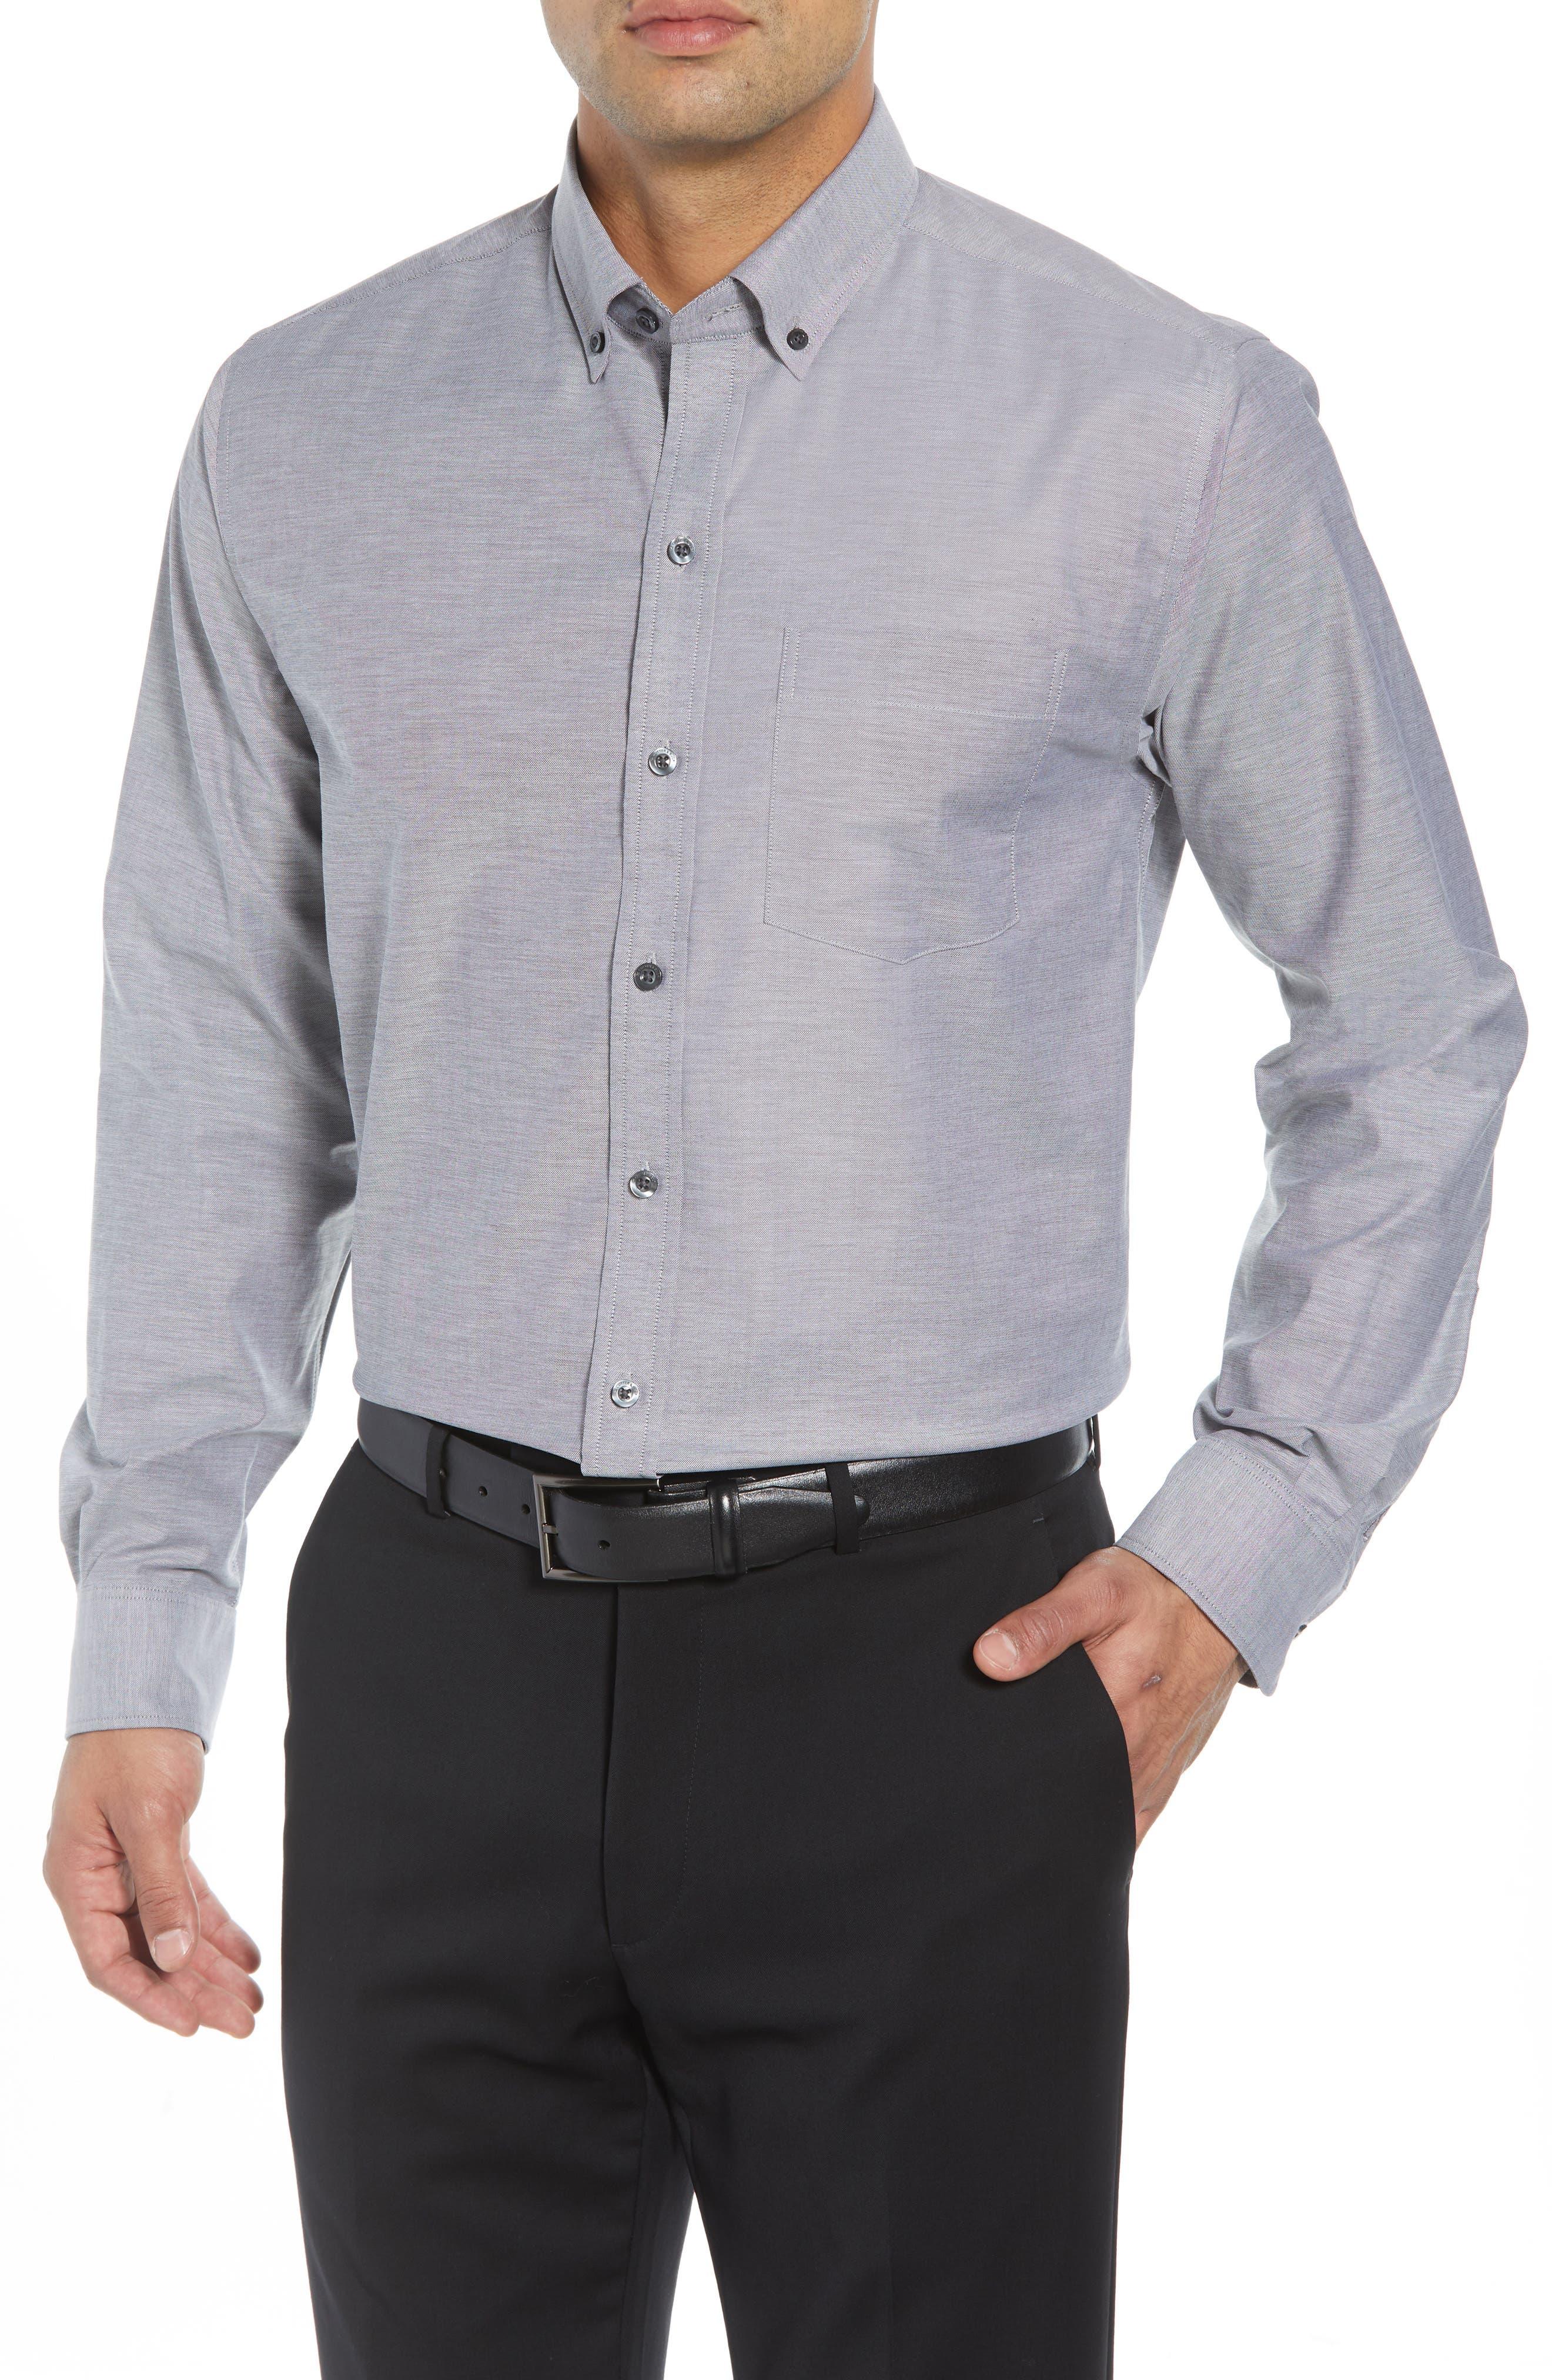 Tailor Regular Fit Oxford Sport Shirt,                             Main thumbnail 1, color,                             CHARCOAL 2